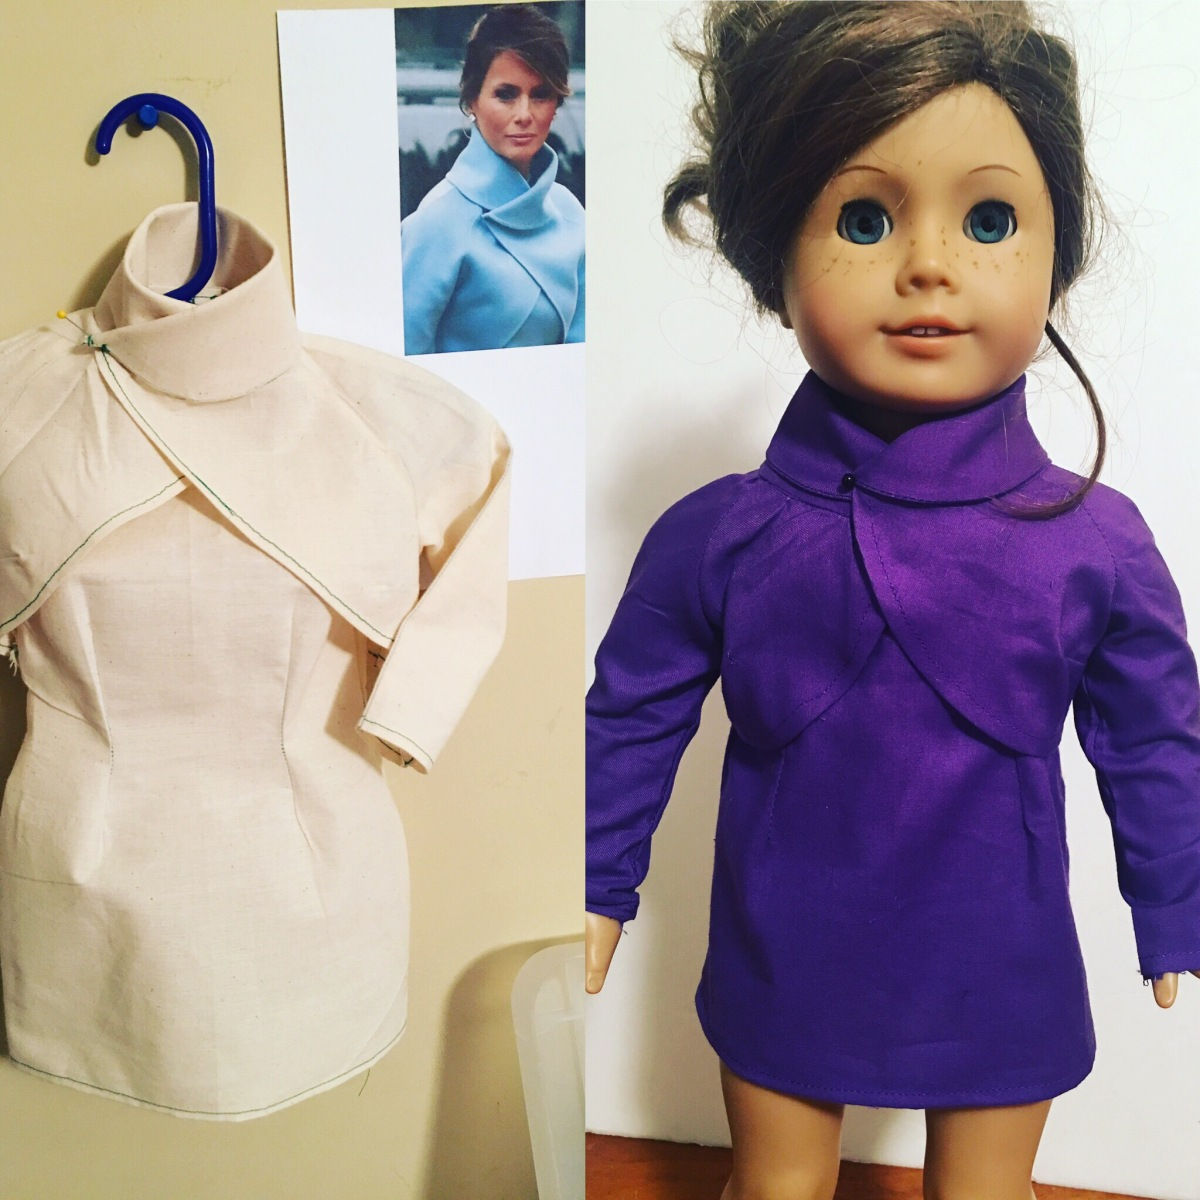 The Tiffany BlueSuit